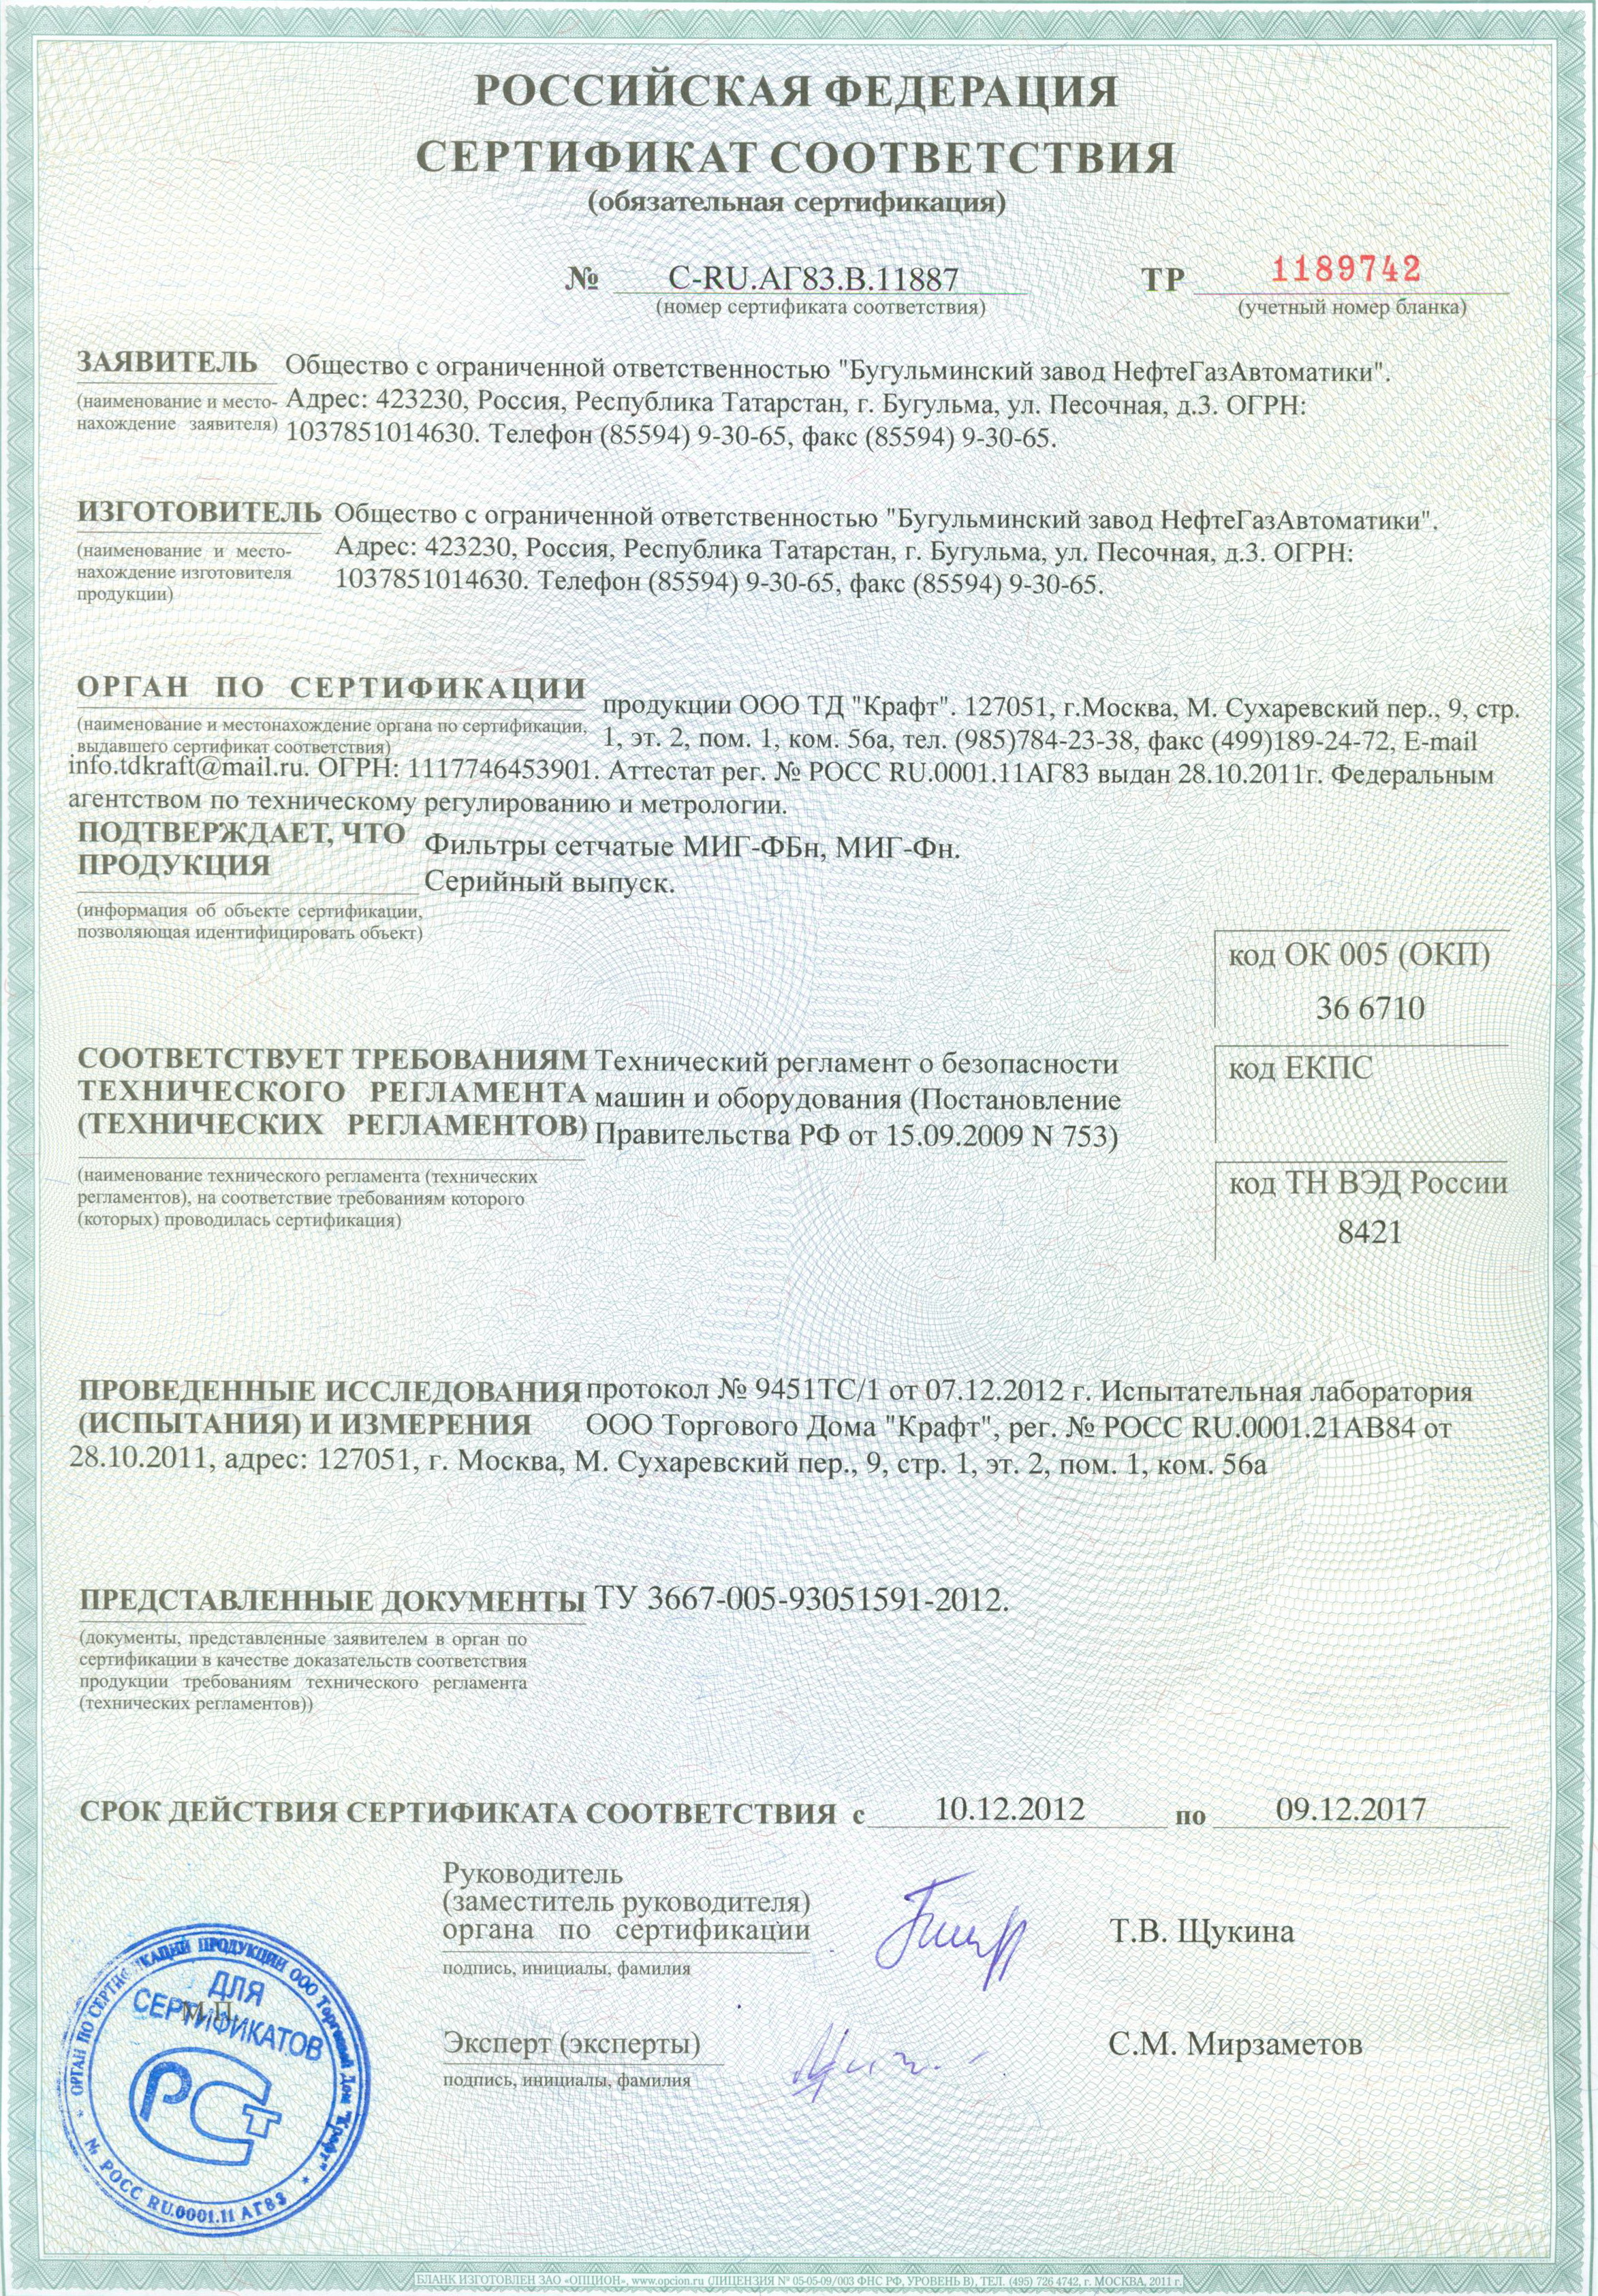 Сертифика́т соотве́тствия